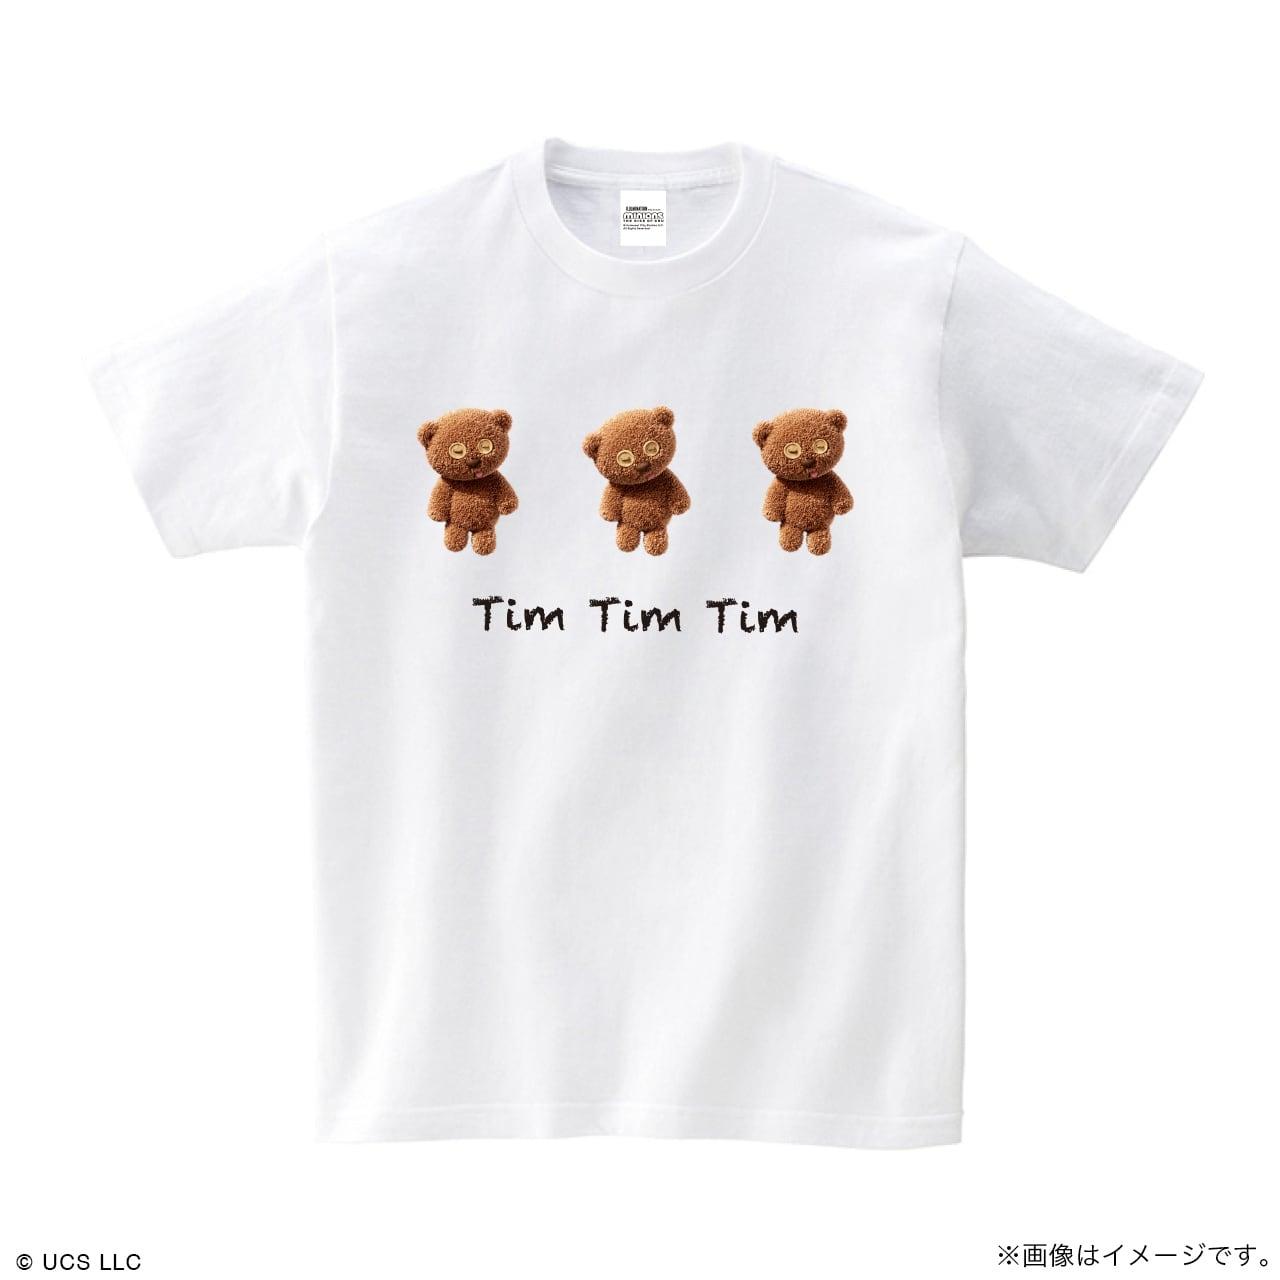 Tシャツ/ミニオン(Tim Tim Tim ホワイト)【MINIONS POP UP STORE 限定】